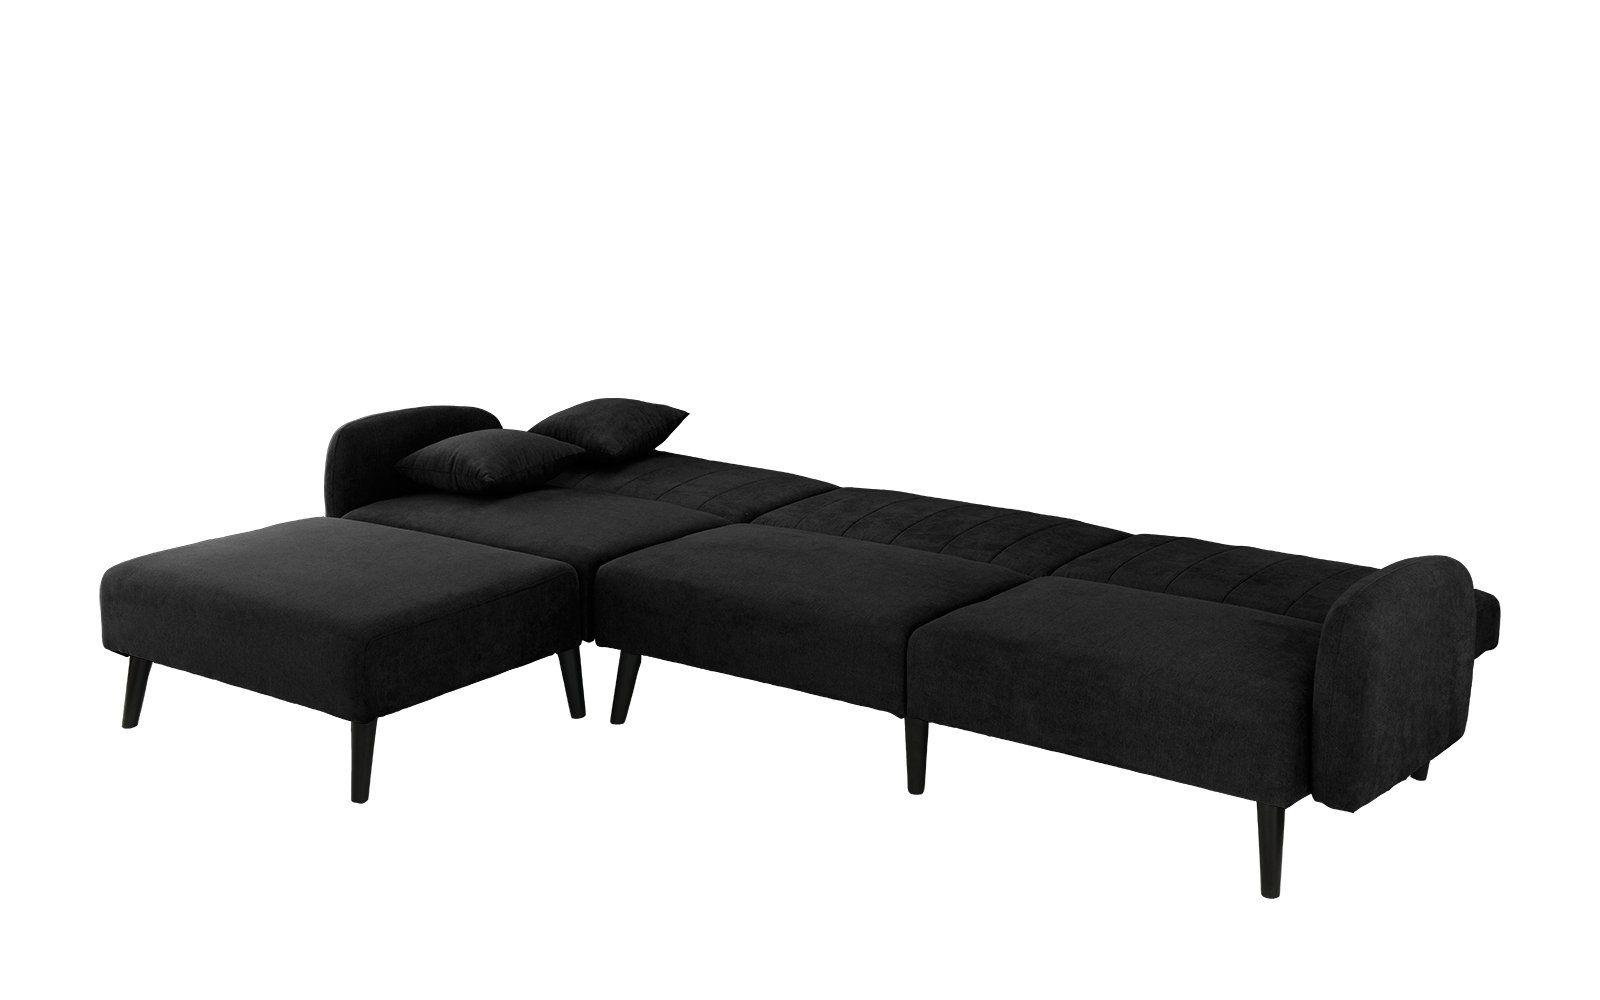 Terrific Mid Century Modern Style Linen Fabric Sleeper Futon Sofa Forskolin Free Trial Chair Design Images Forskolin Free Trialorg